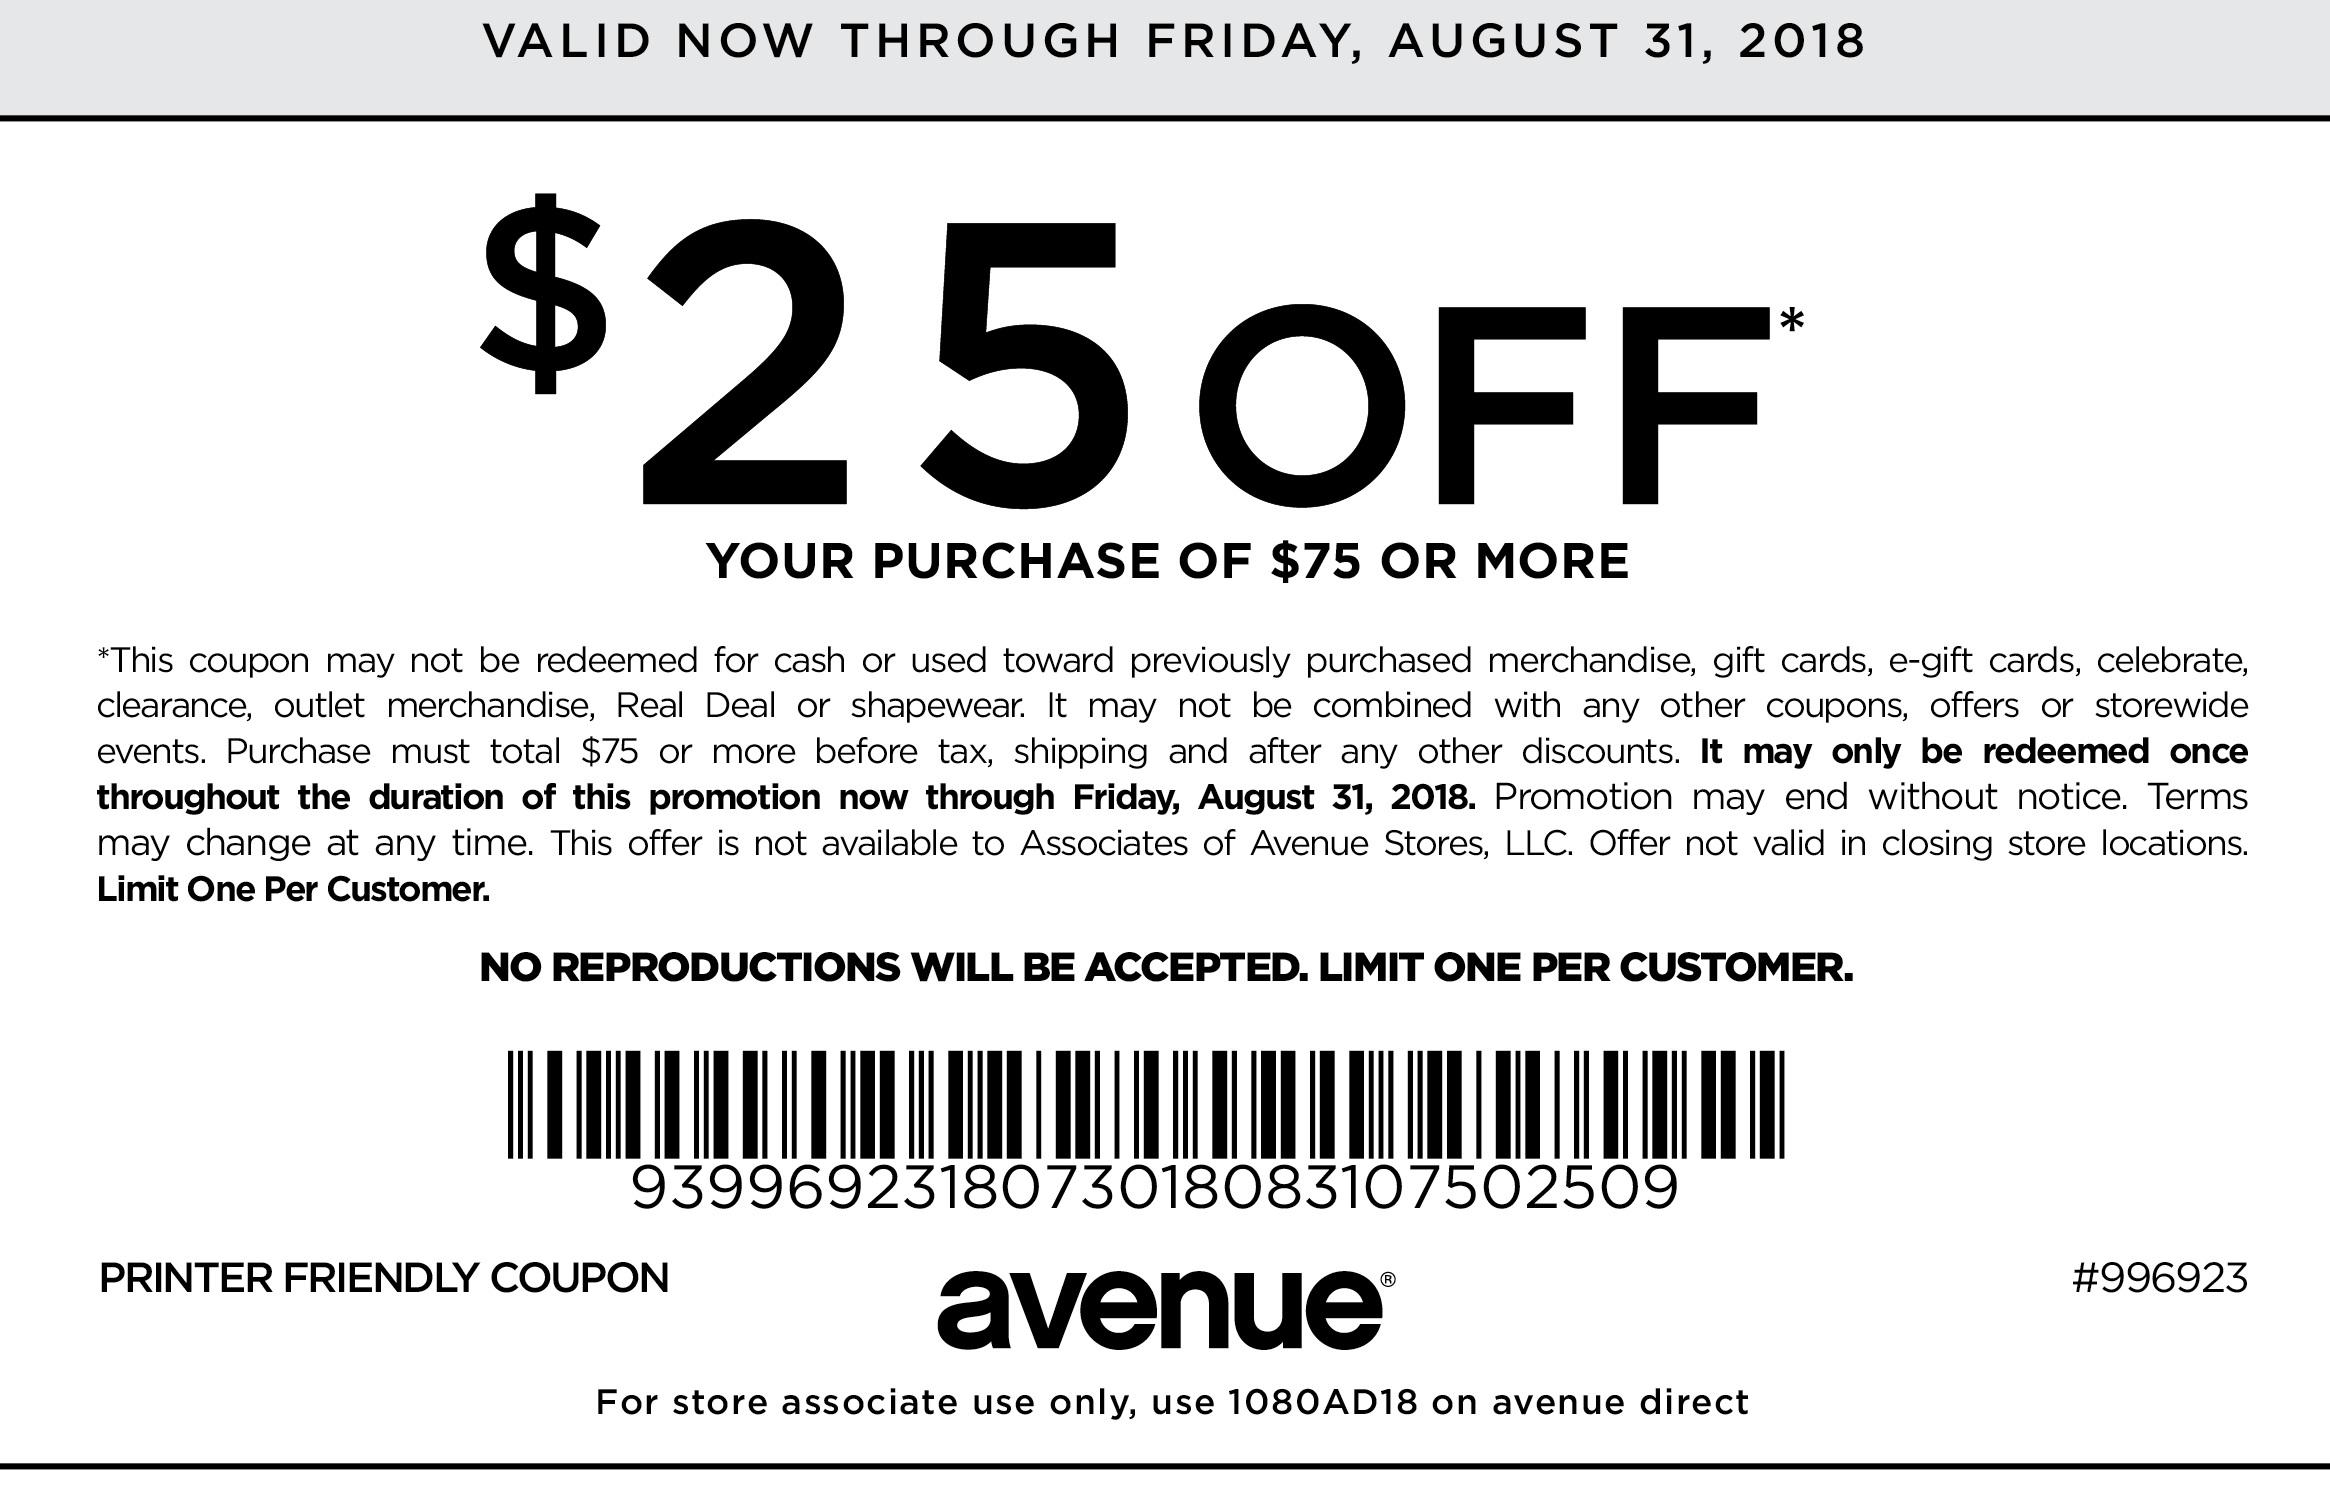 Avenue.com Promo Coupon $25 off $75 at Avenue